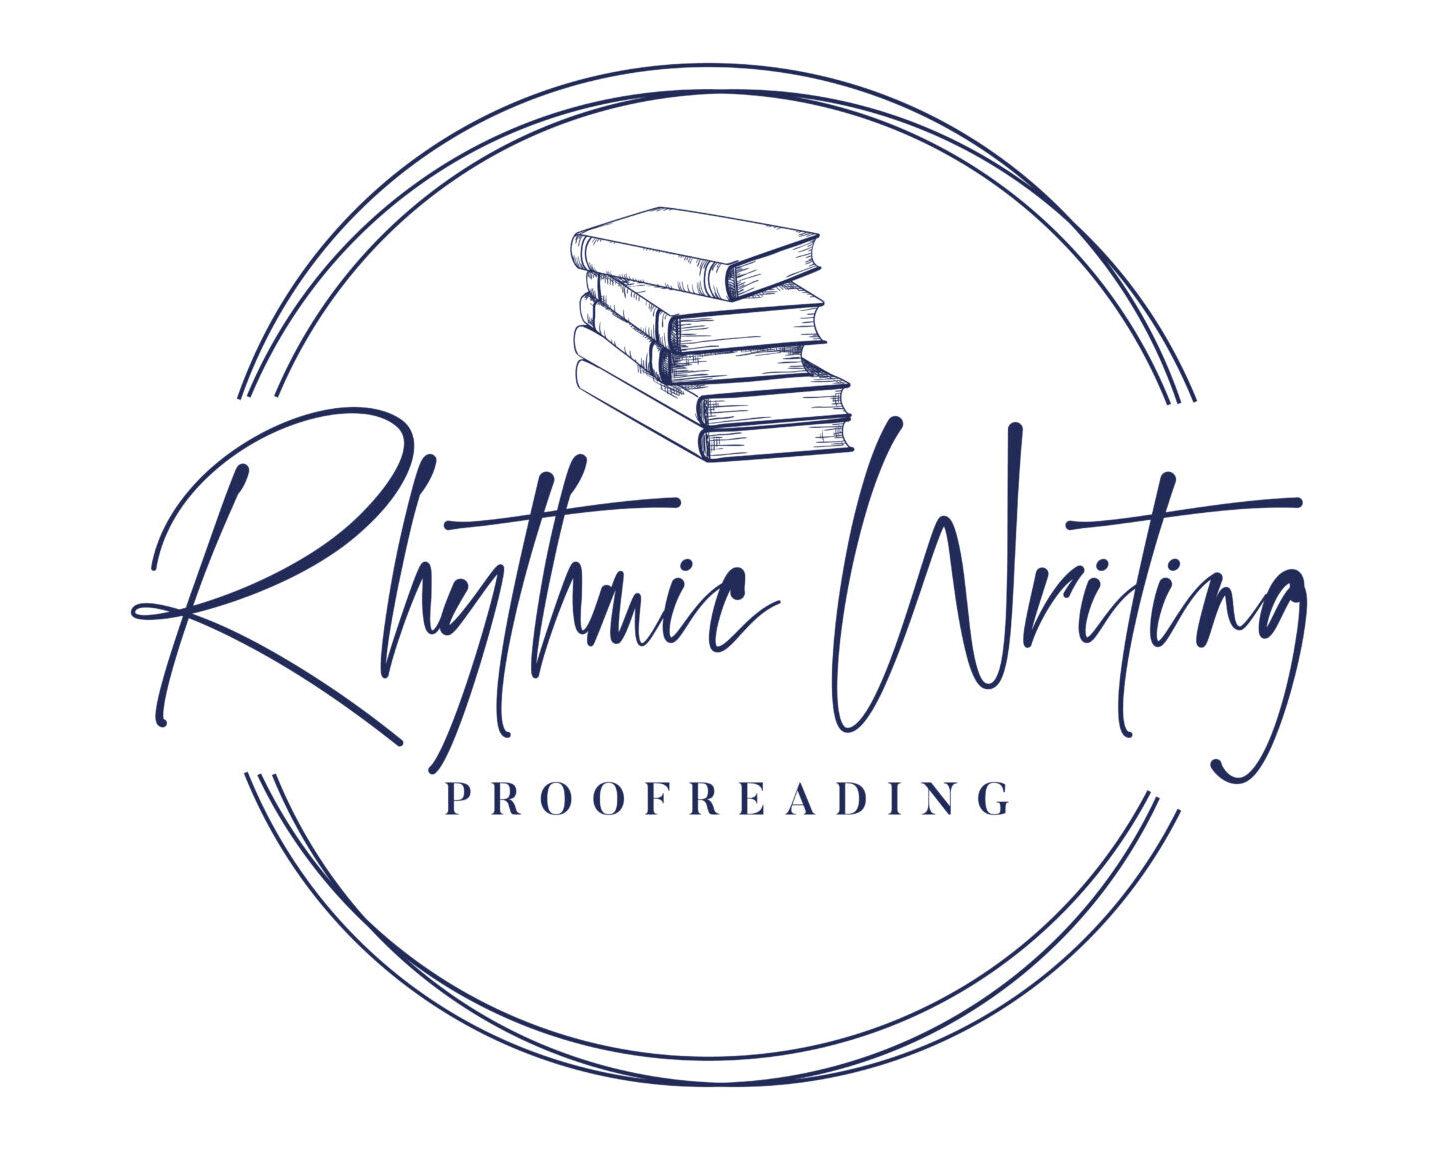 Rhythmic Writing Proofreading